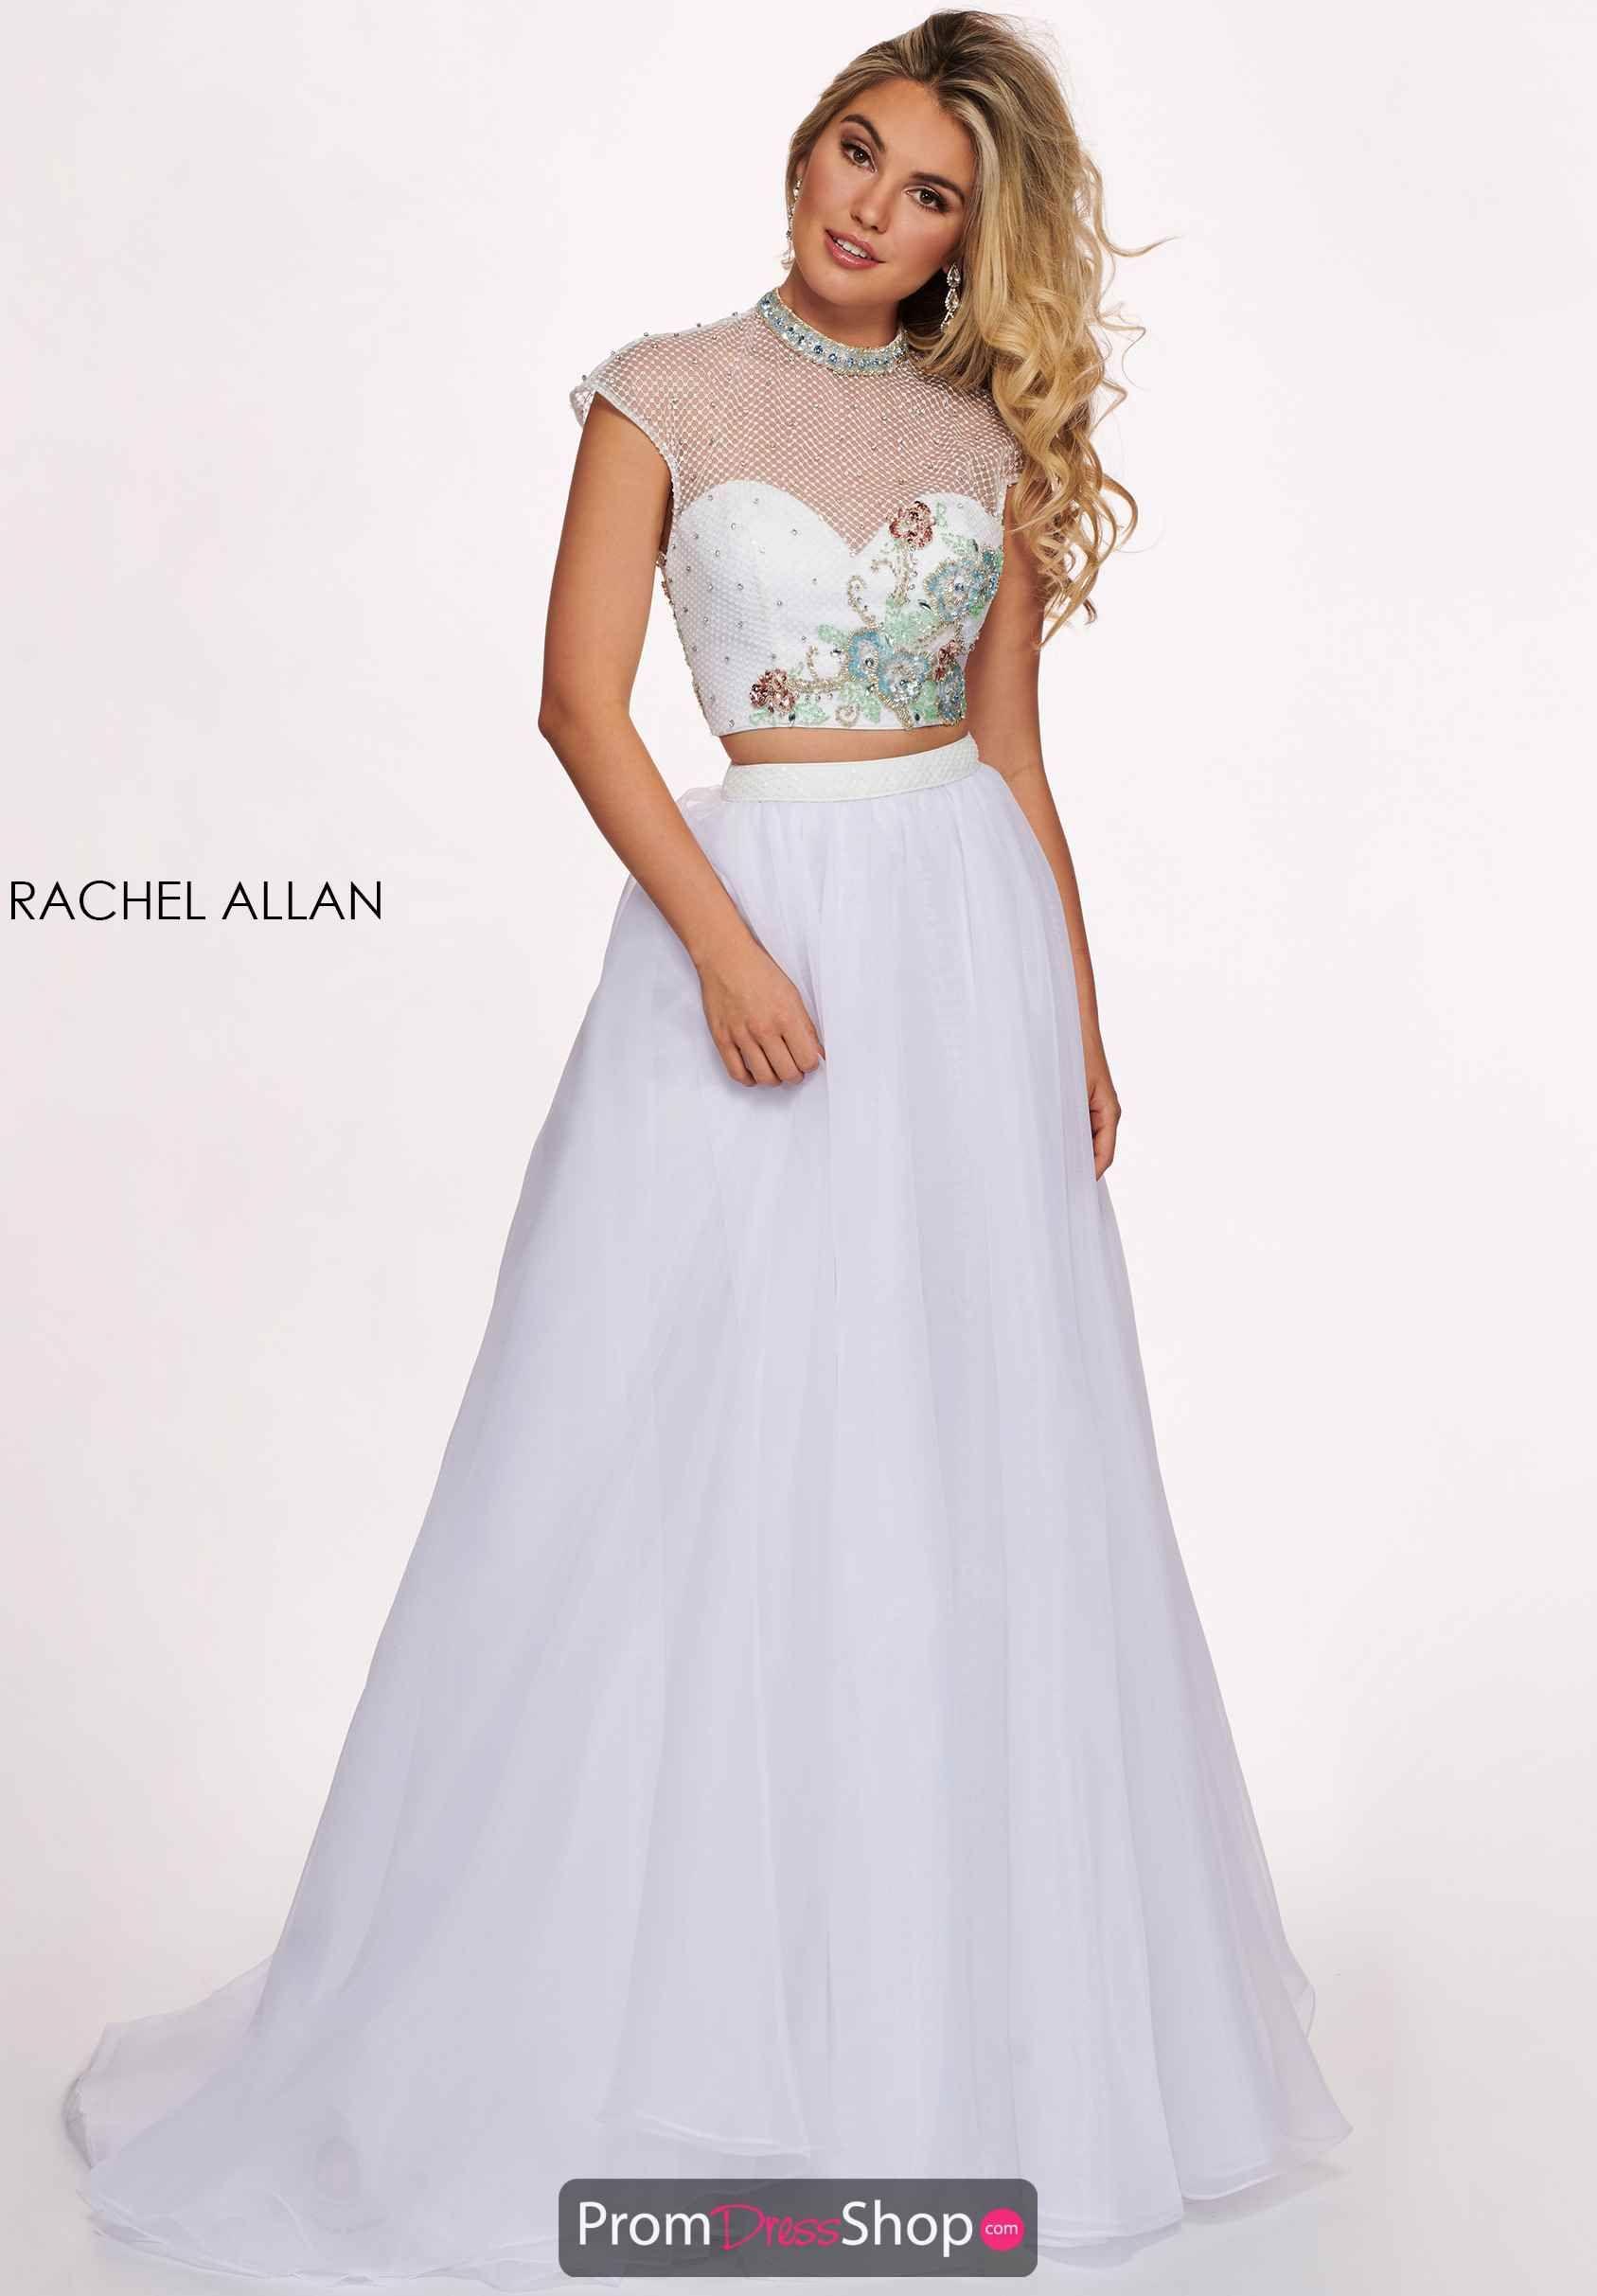 Rachel Allan Prom Dresses Prom Dresses Prom Dresses Short Prom Dresses Long Blue [ 2425 x 1687 Pixel ]